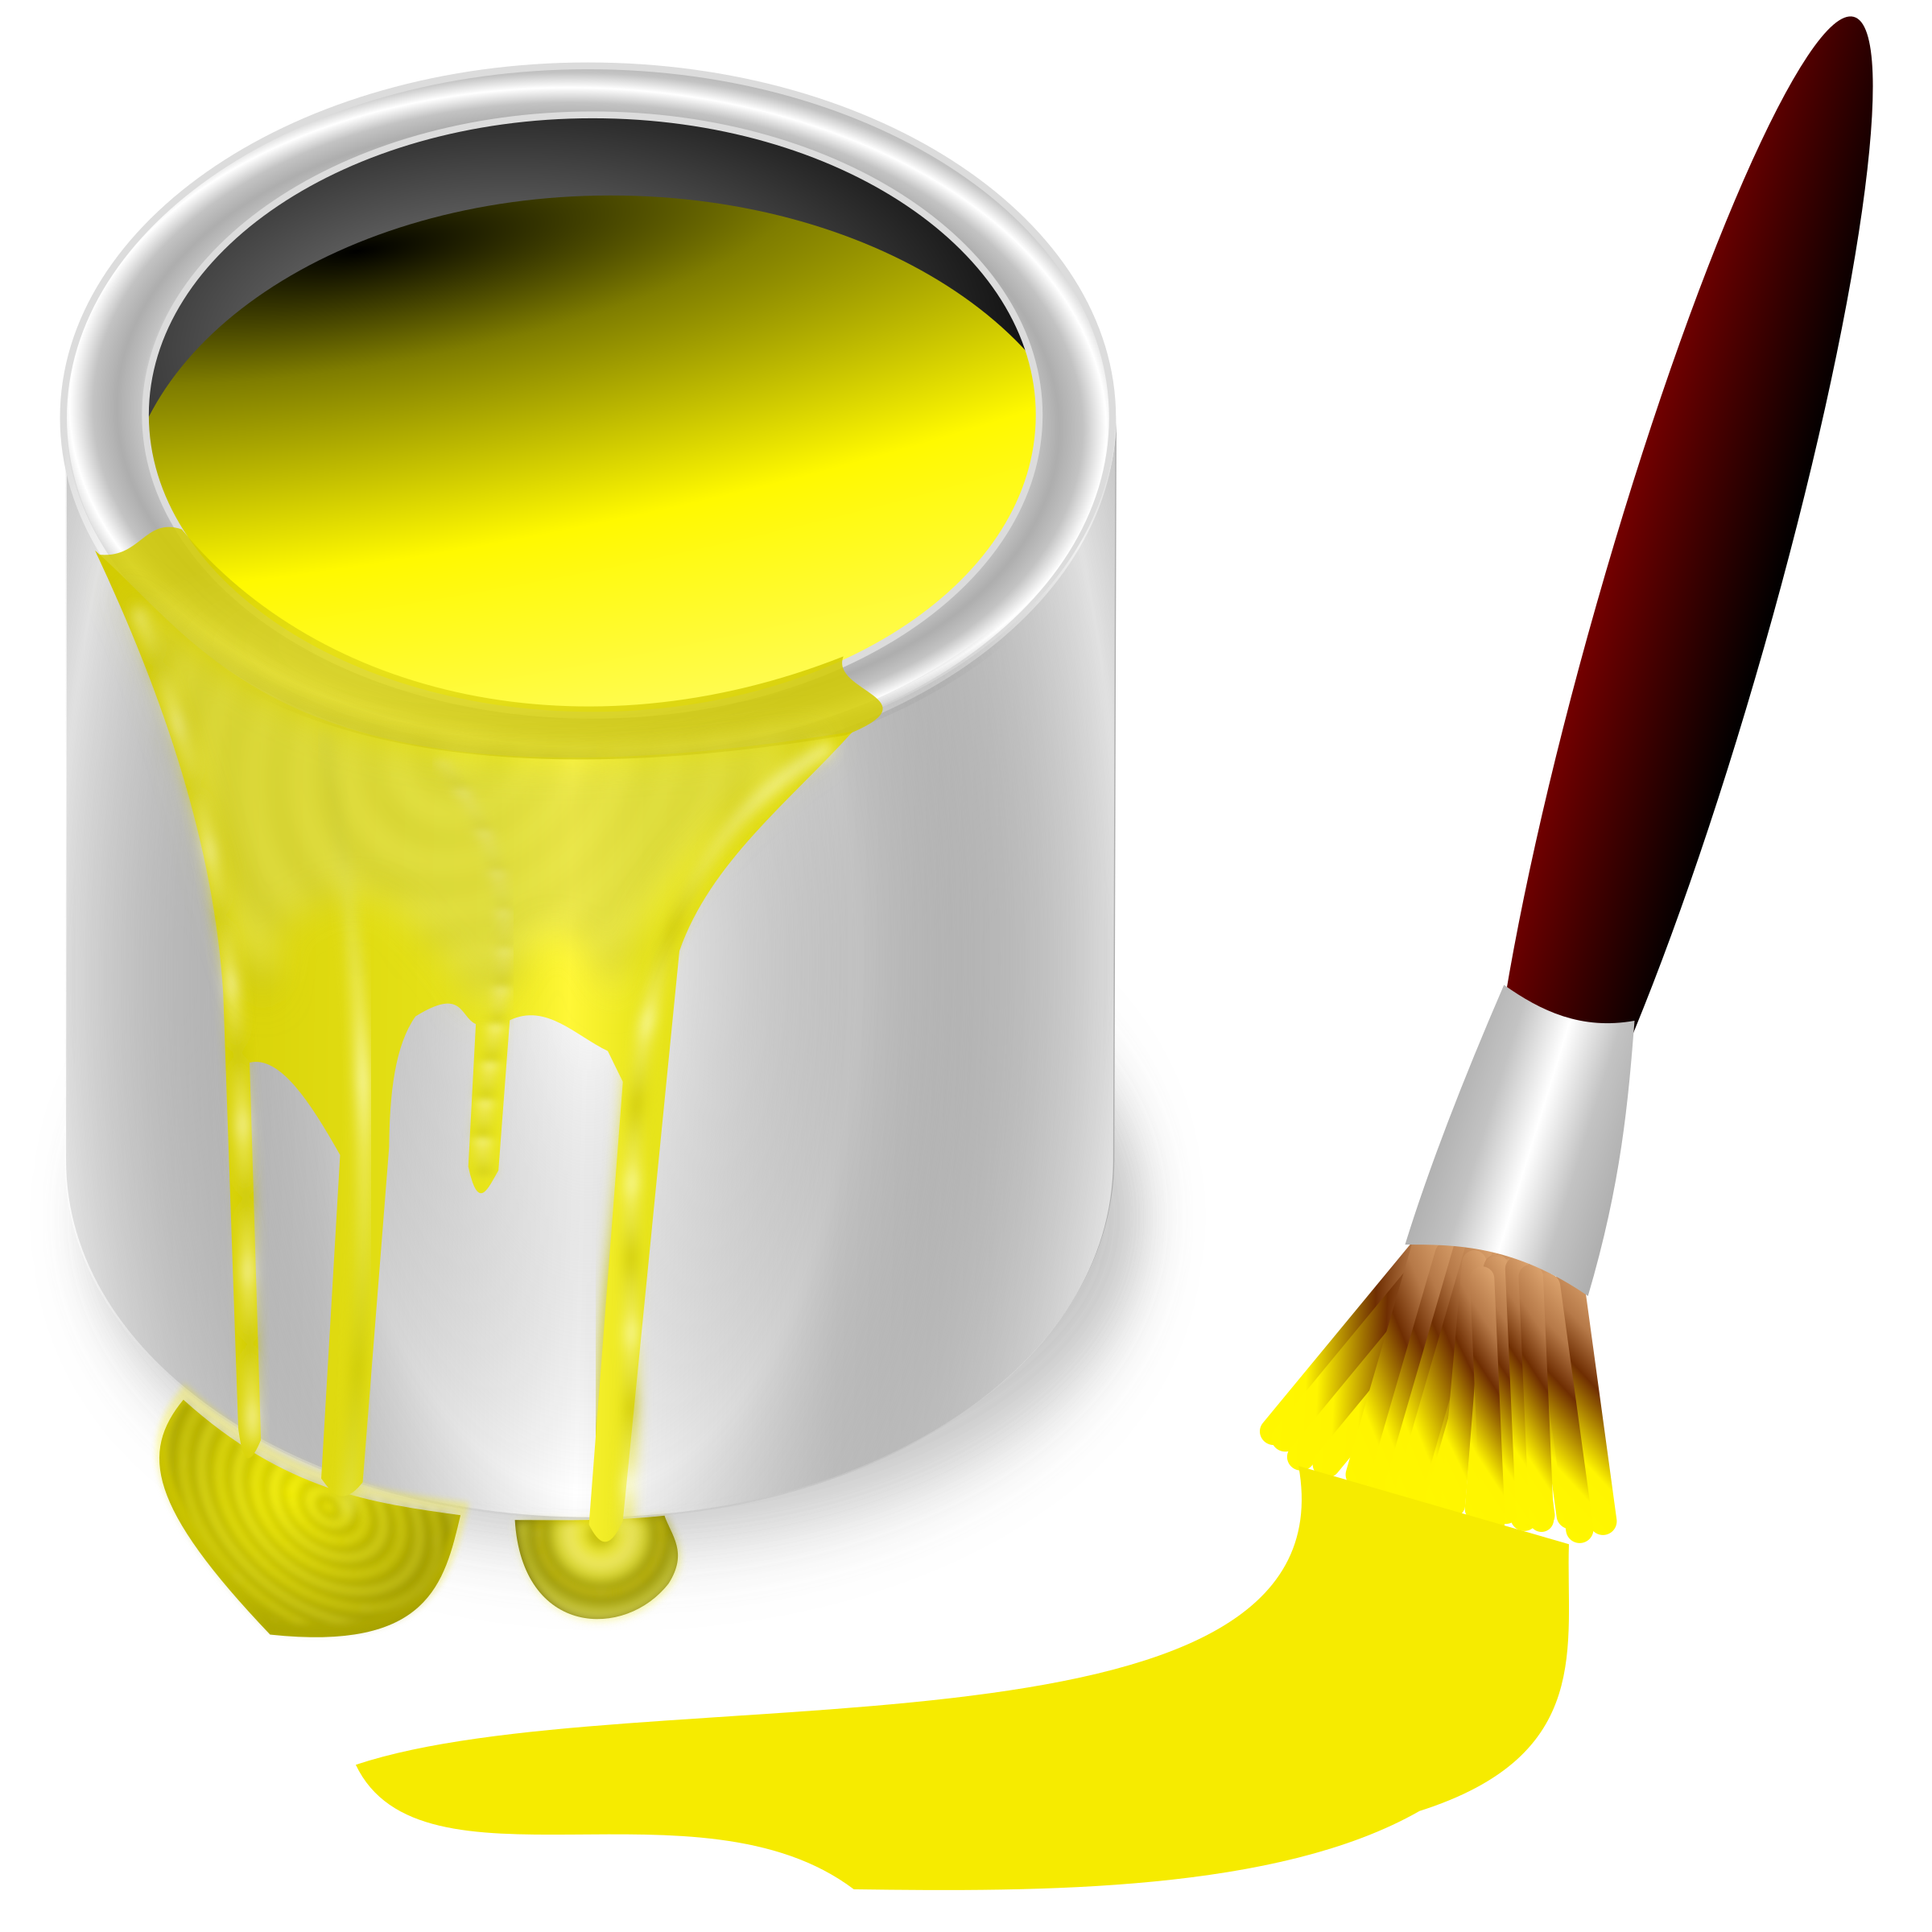 Bucket yellow big image. Humpty dumpty clipart color